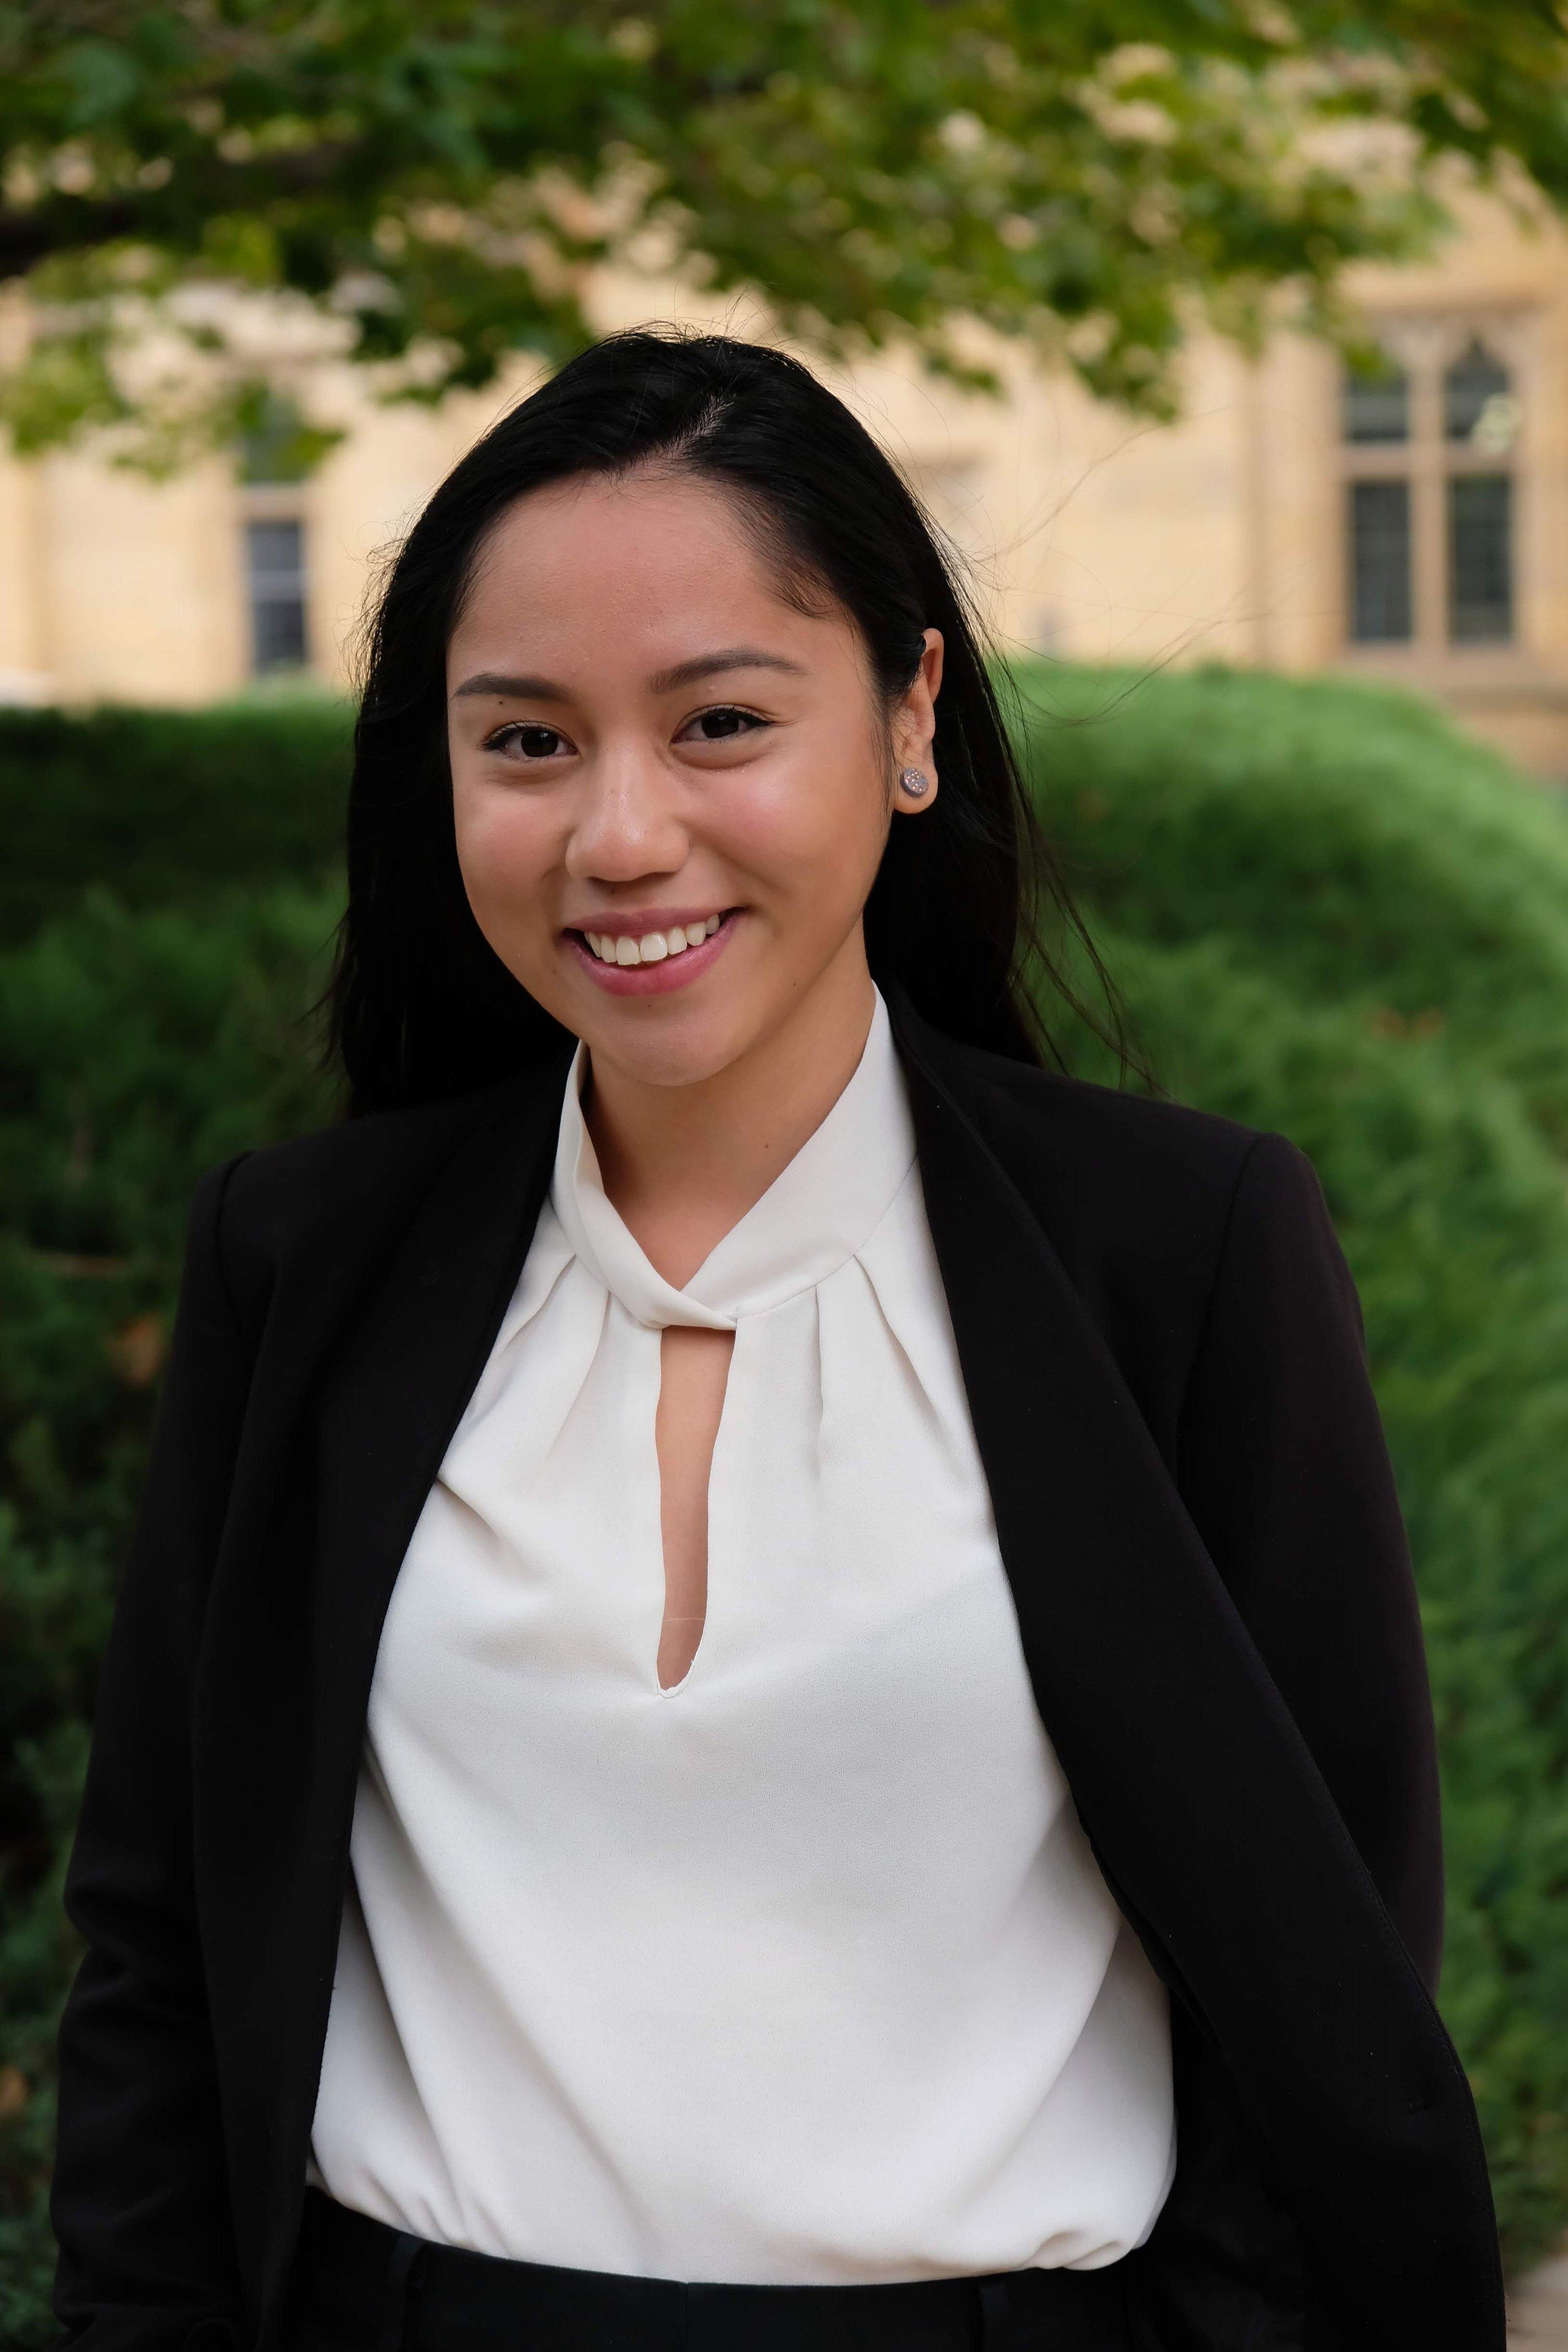 Trianna Valdes - Initiatives Project Leader